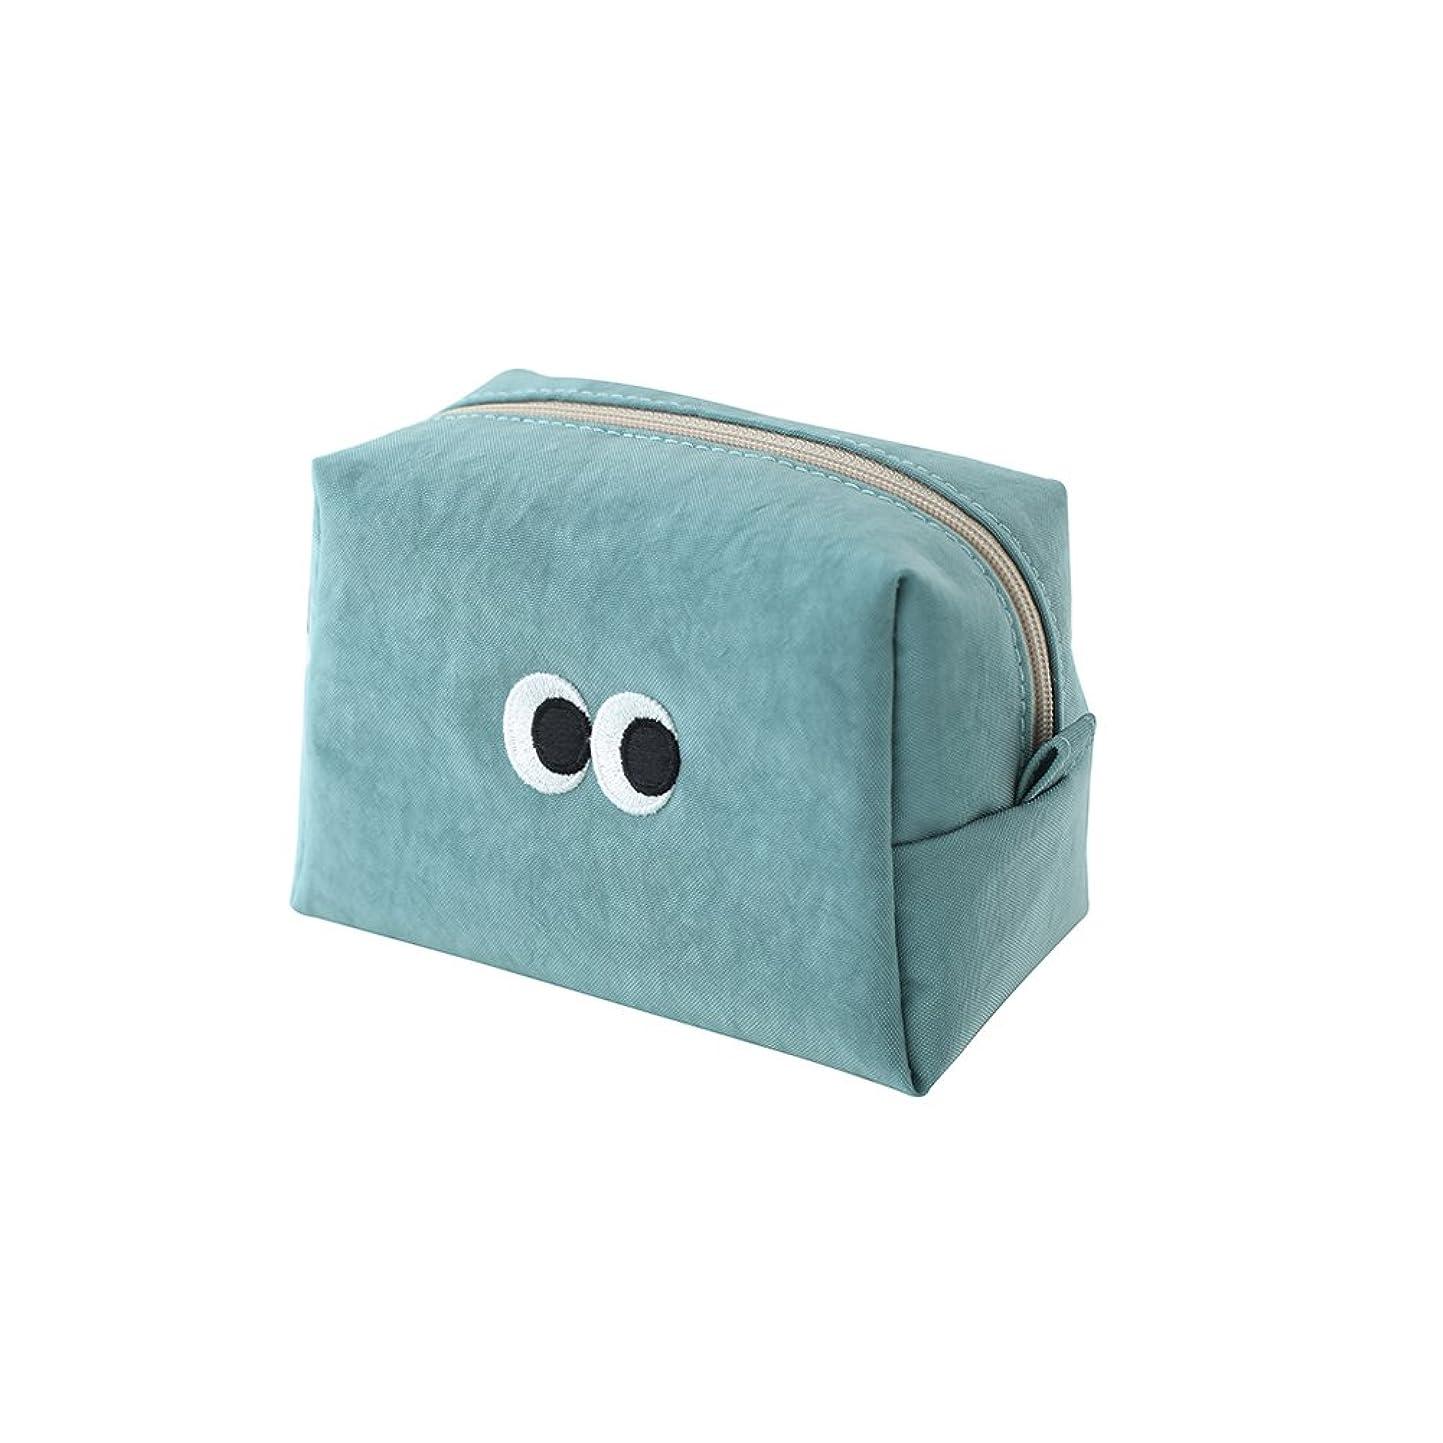 [LIVEWORK] SOM SOM Stitch Makeup Pouch ソムソムスティッチメイクアップポーチ 小物入れ コスメポーチ 便利 シンプル かわいい